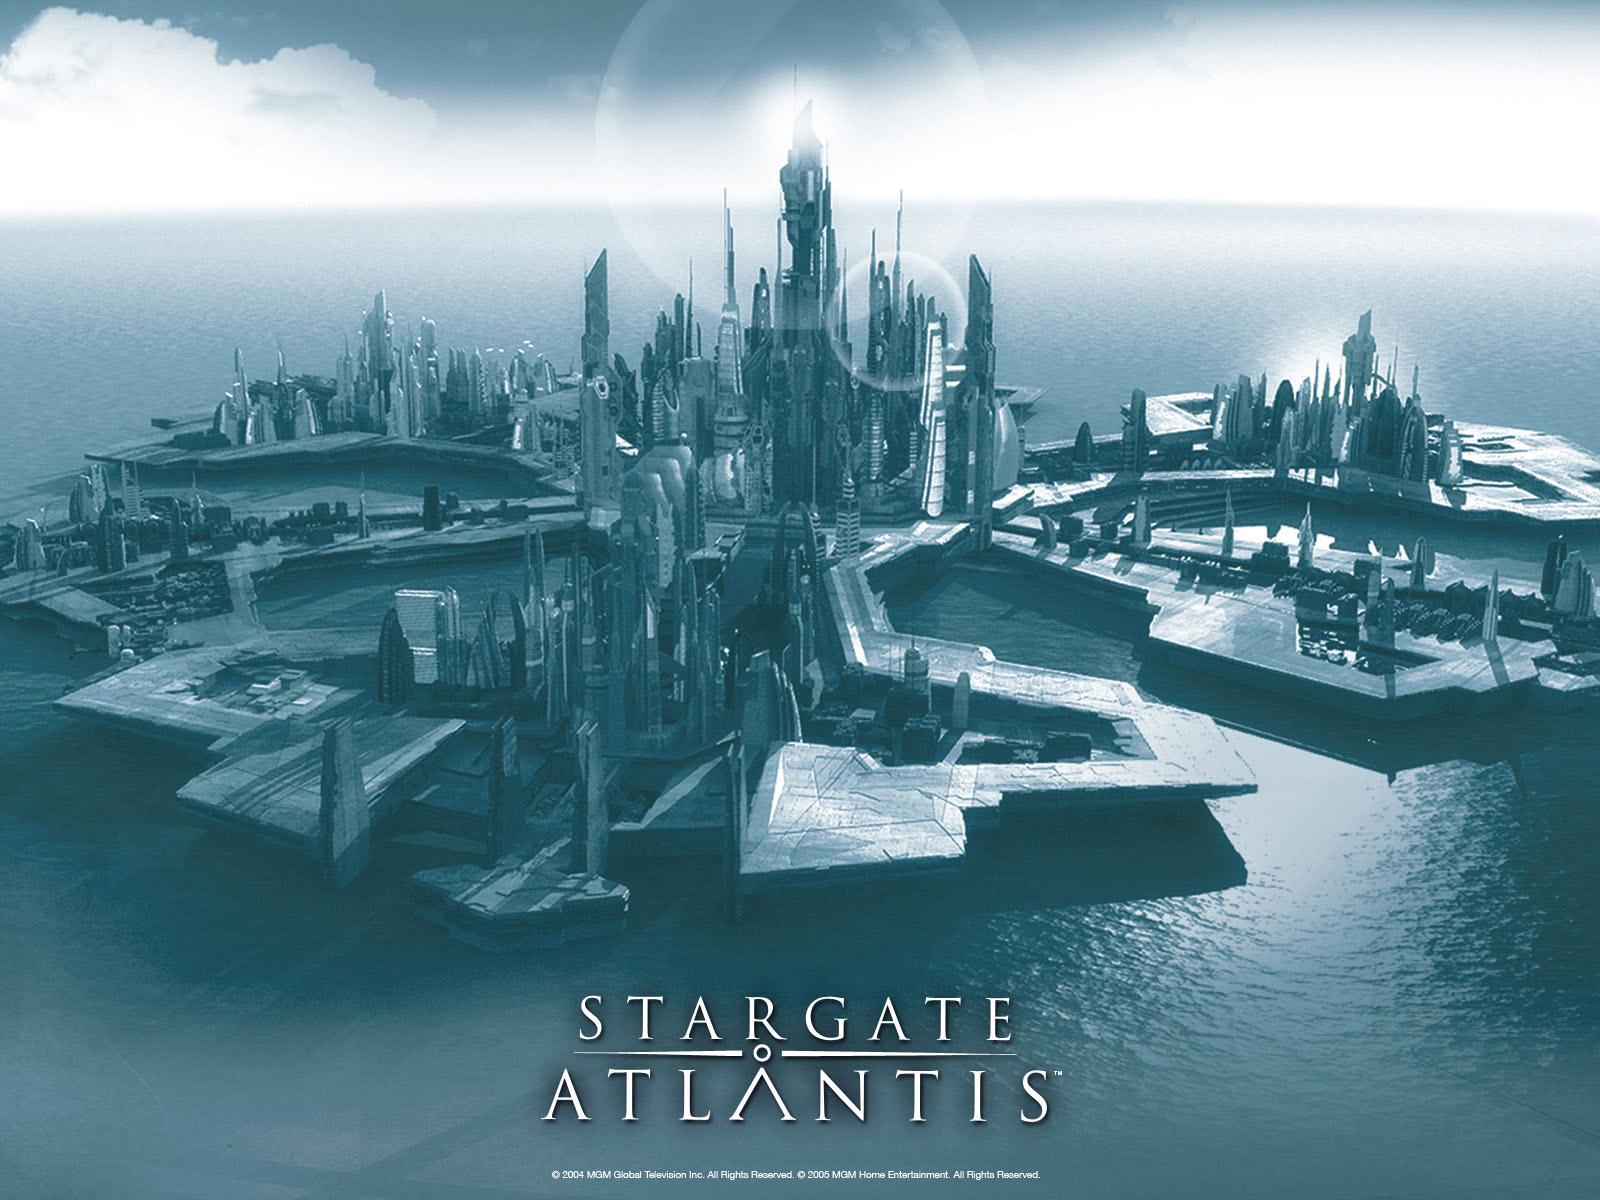 http://1.bp.blogspot.com/-wHiPu8pfhz0/Tnoa6_obTYI/AAAAAAAAIbk/yYgh5pnAkLU/s1600/Wallpapers+2992-46-Stargate-Atlantis.jpg